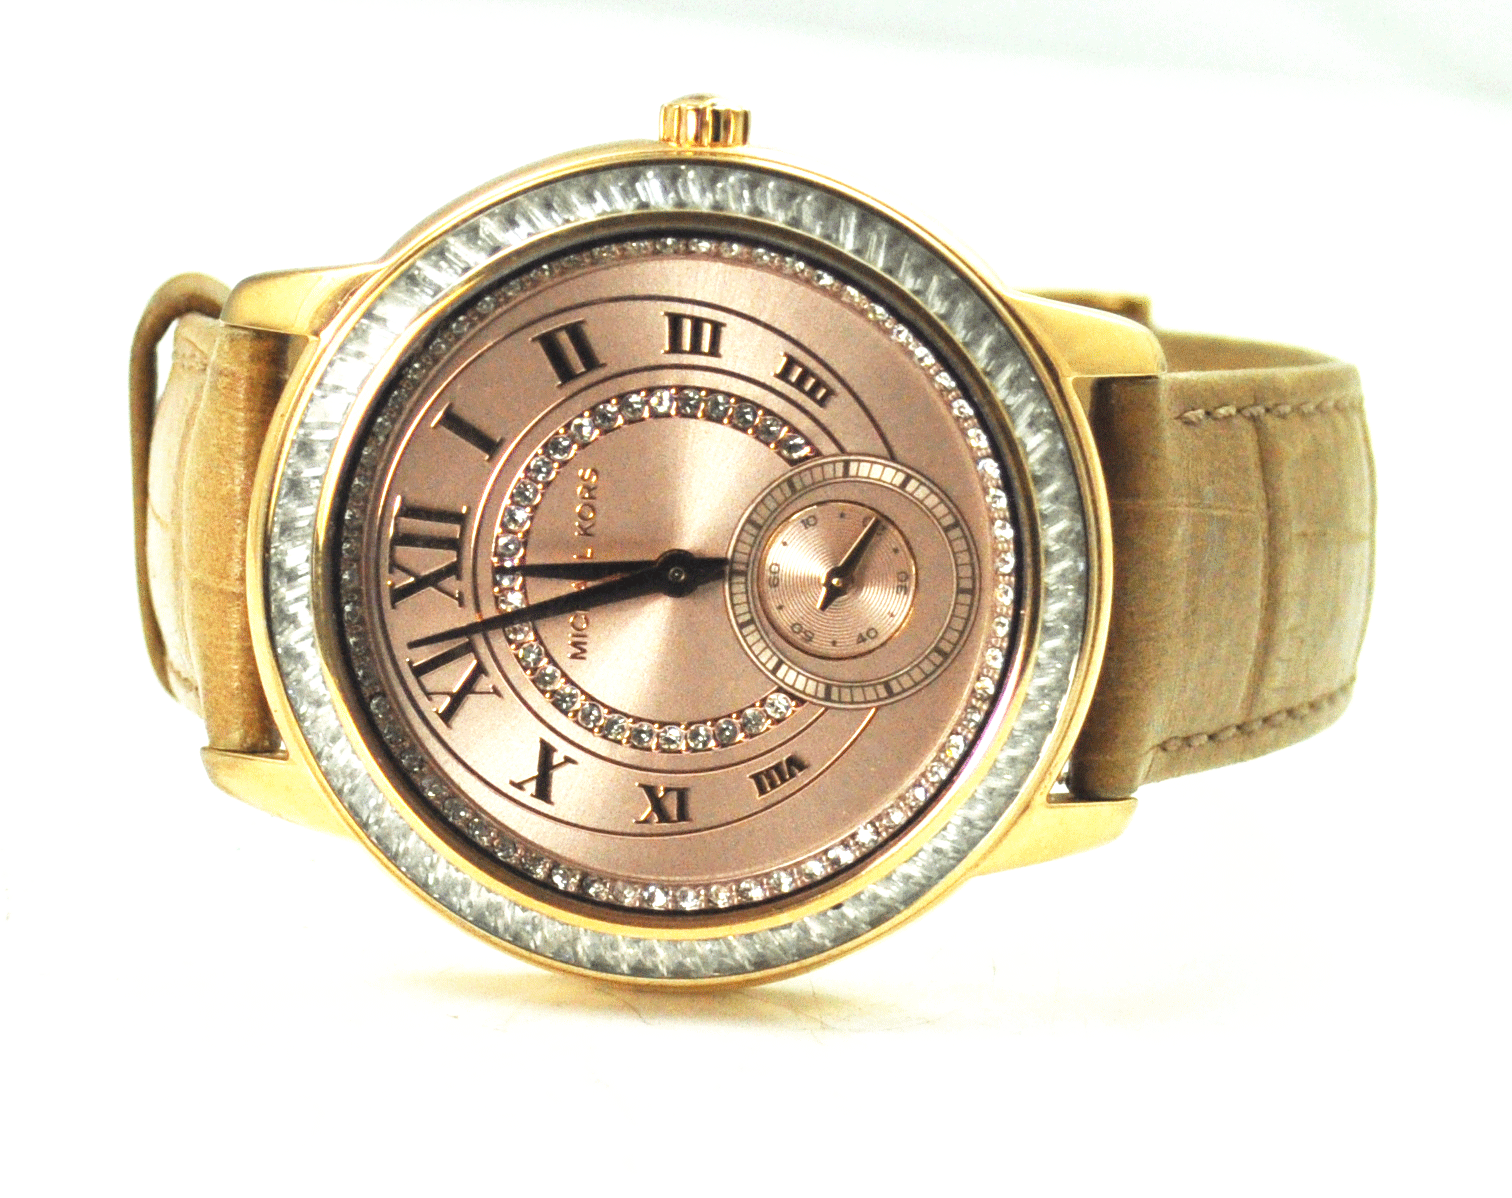 4465270ae3d2 Michael Kors Pink Metallic Roman Dial MK2448 39mm Wristwatch CZ Bezel   Dial  -  69.29